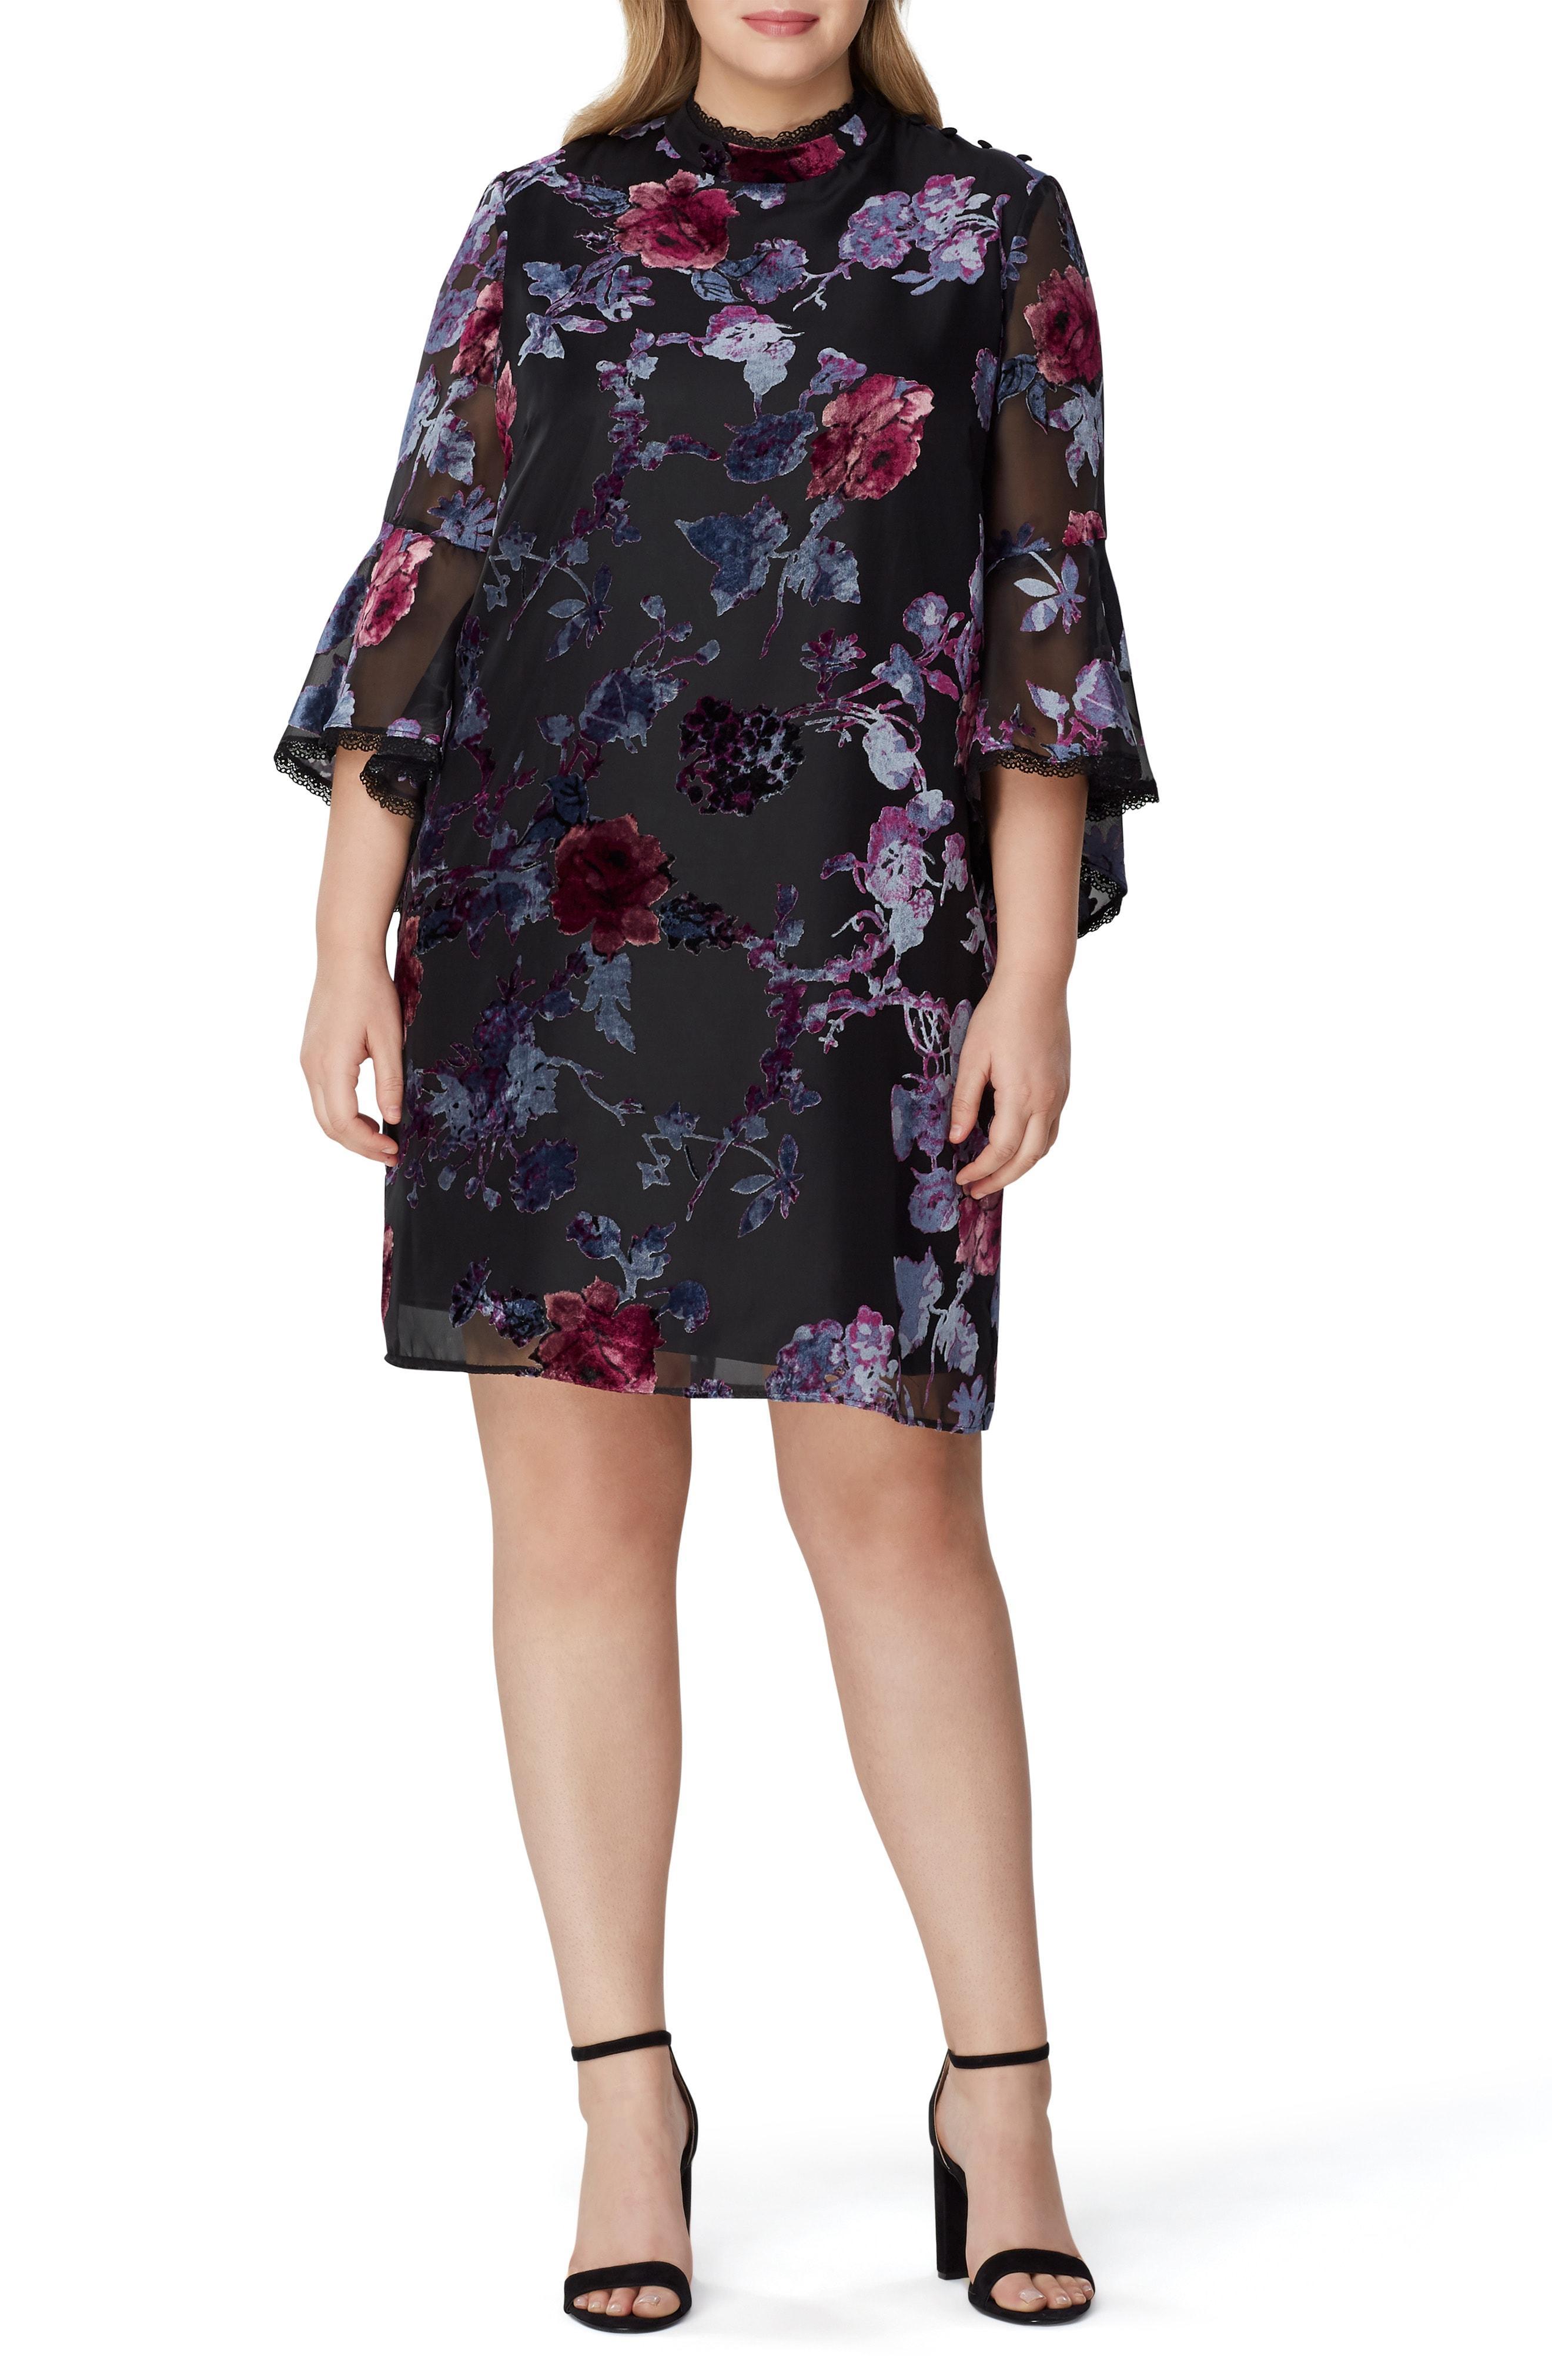 091d5ba8861 Tahari Floral Dress Nordstrom - Gomes Weine AG